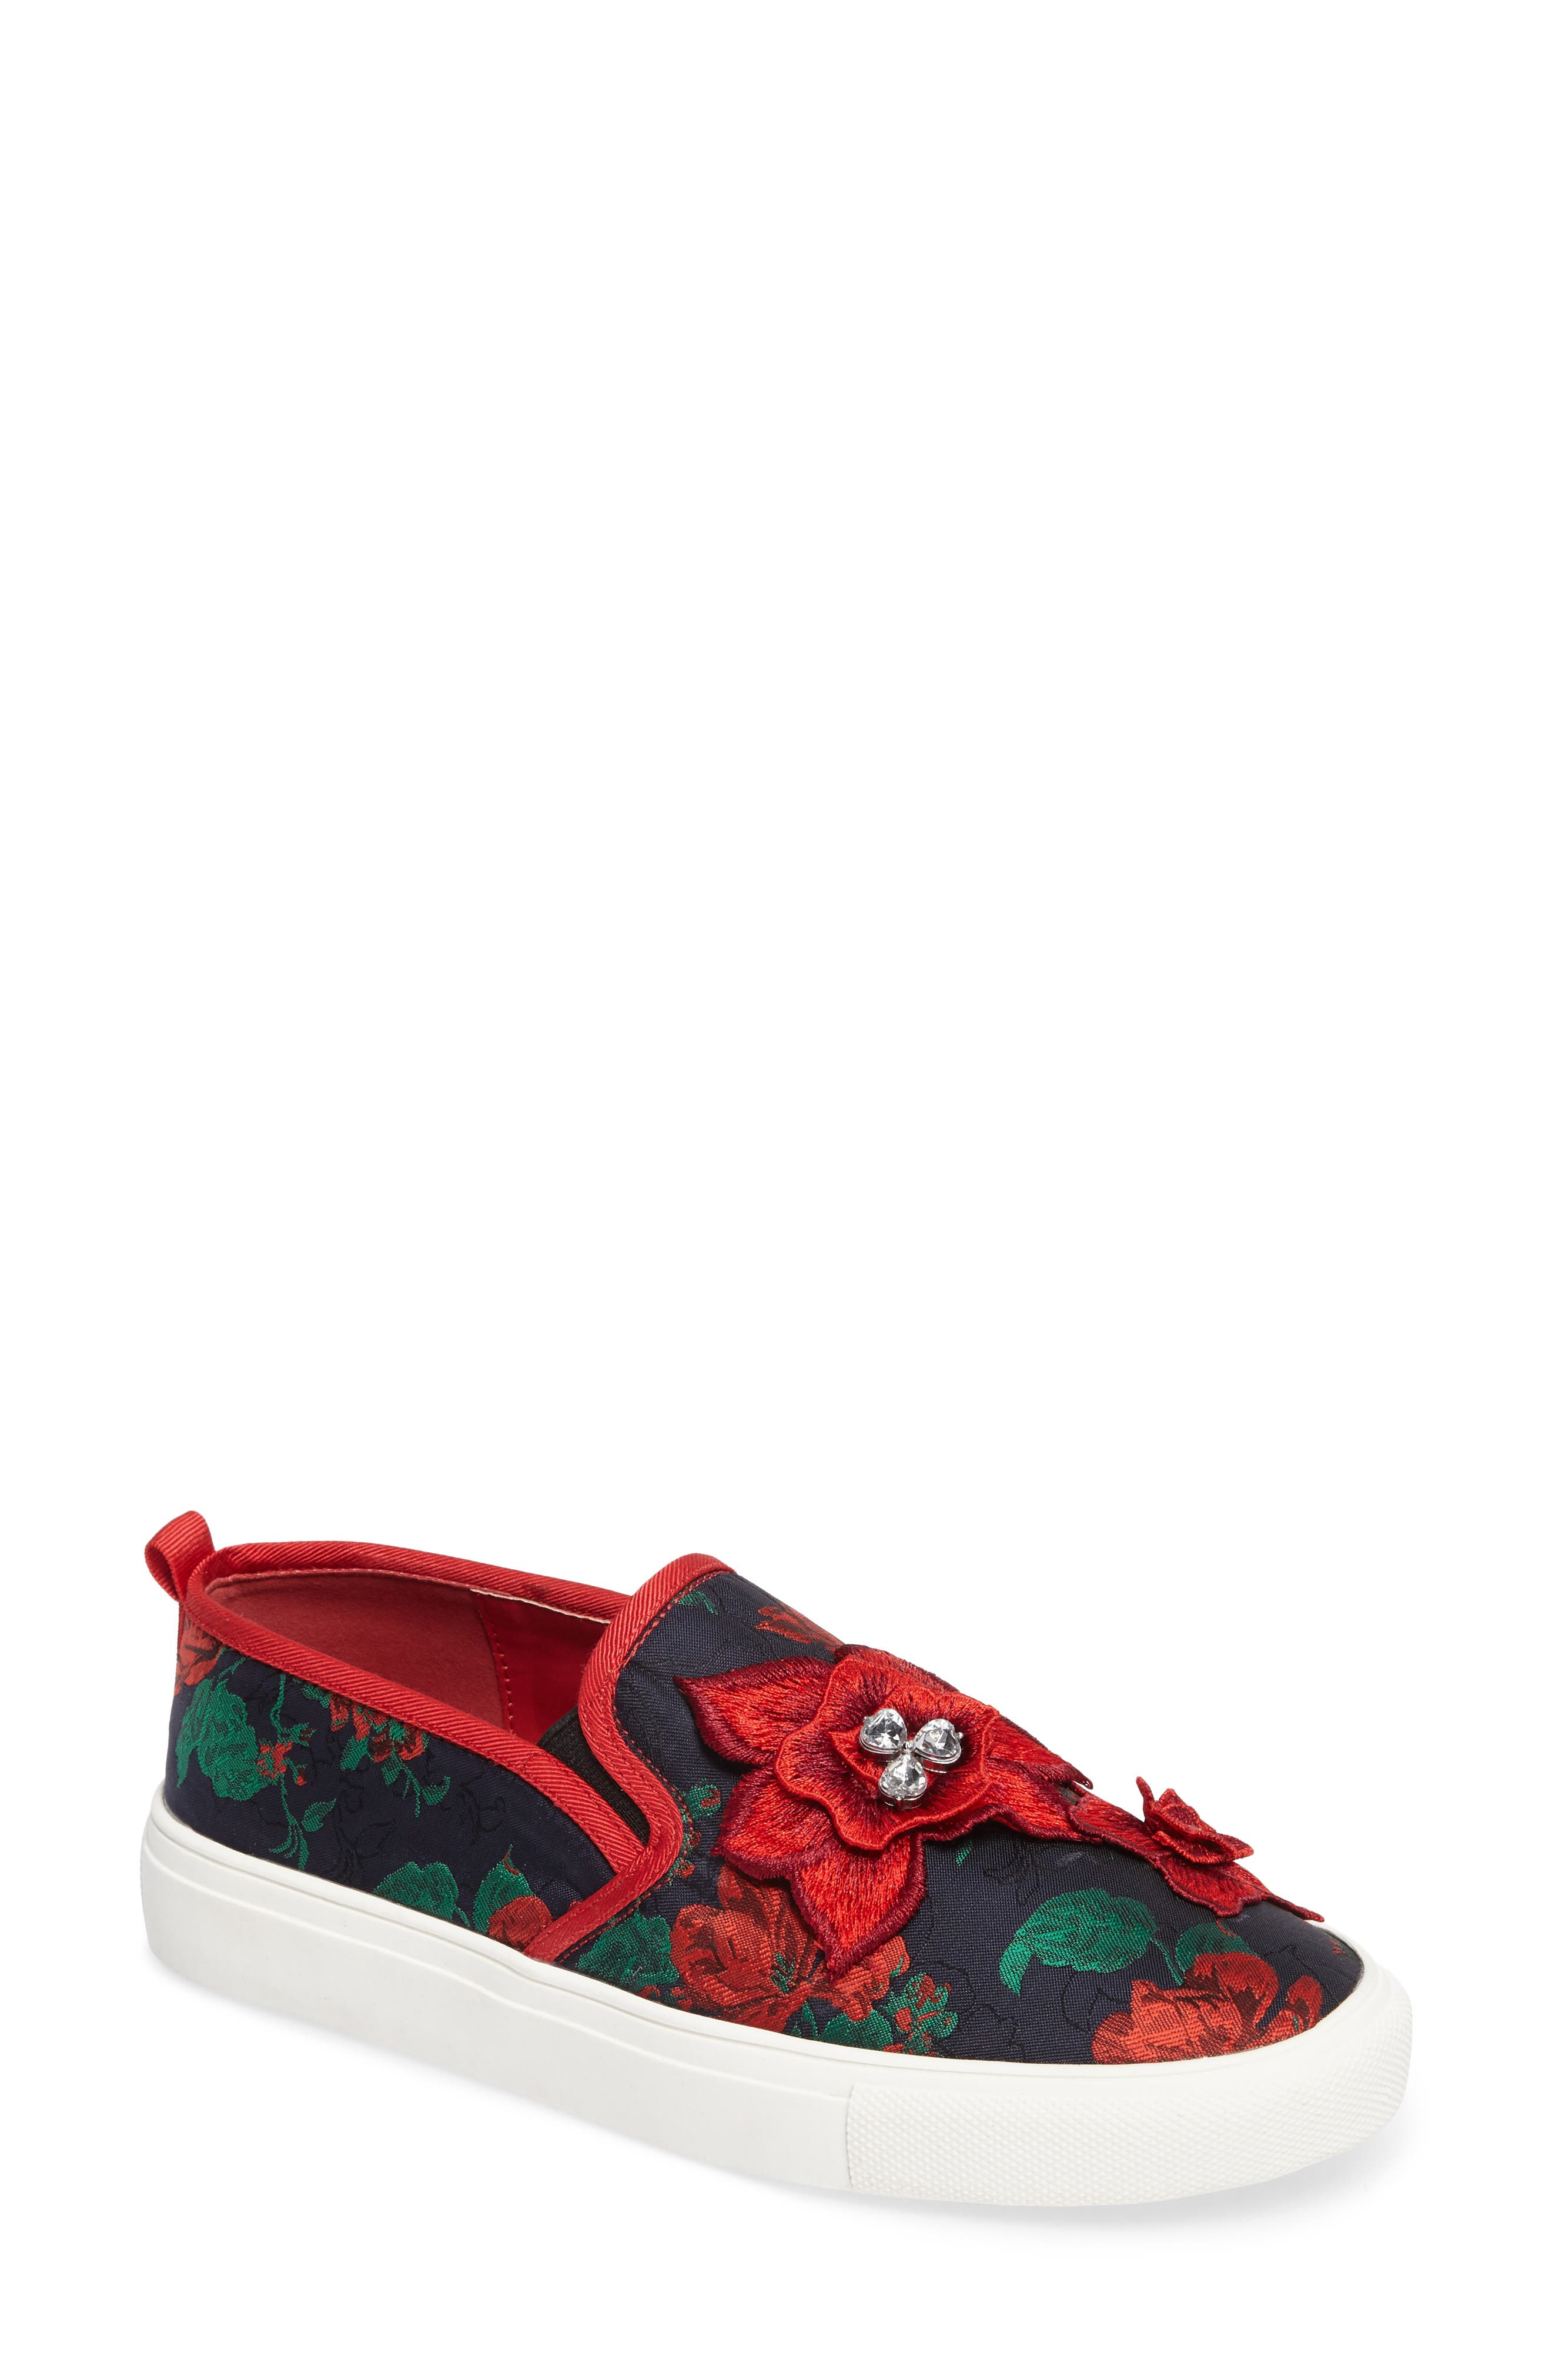 Alternate Image 1 Selected - Topshop Tessa Embroidered Slip-On Sneaker (Women)